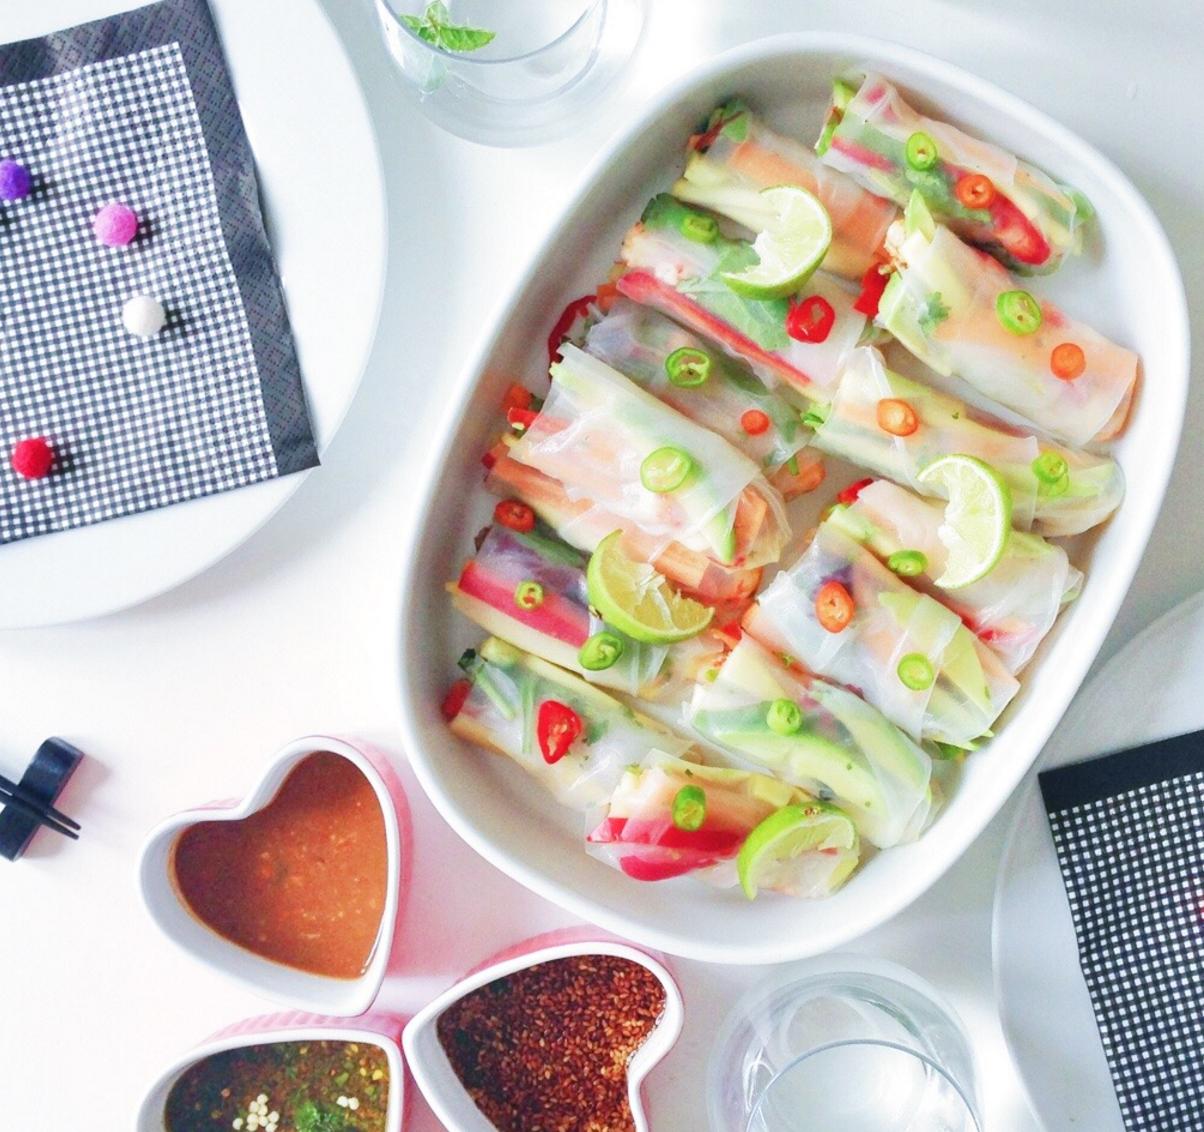 SUNDE OPSKRIFTER Vietnamesiske forårsruller og tre slags dip: chili, peanut og sesam